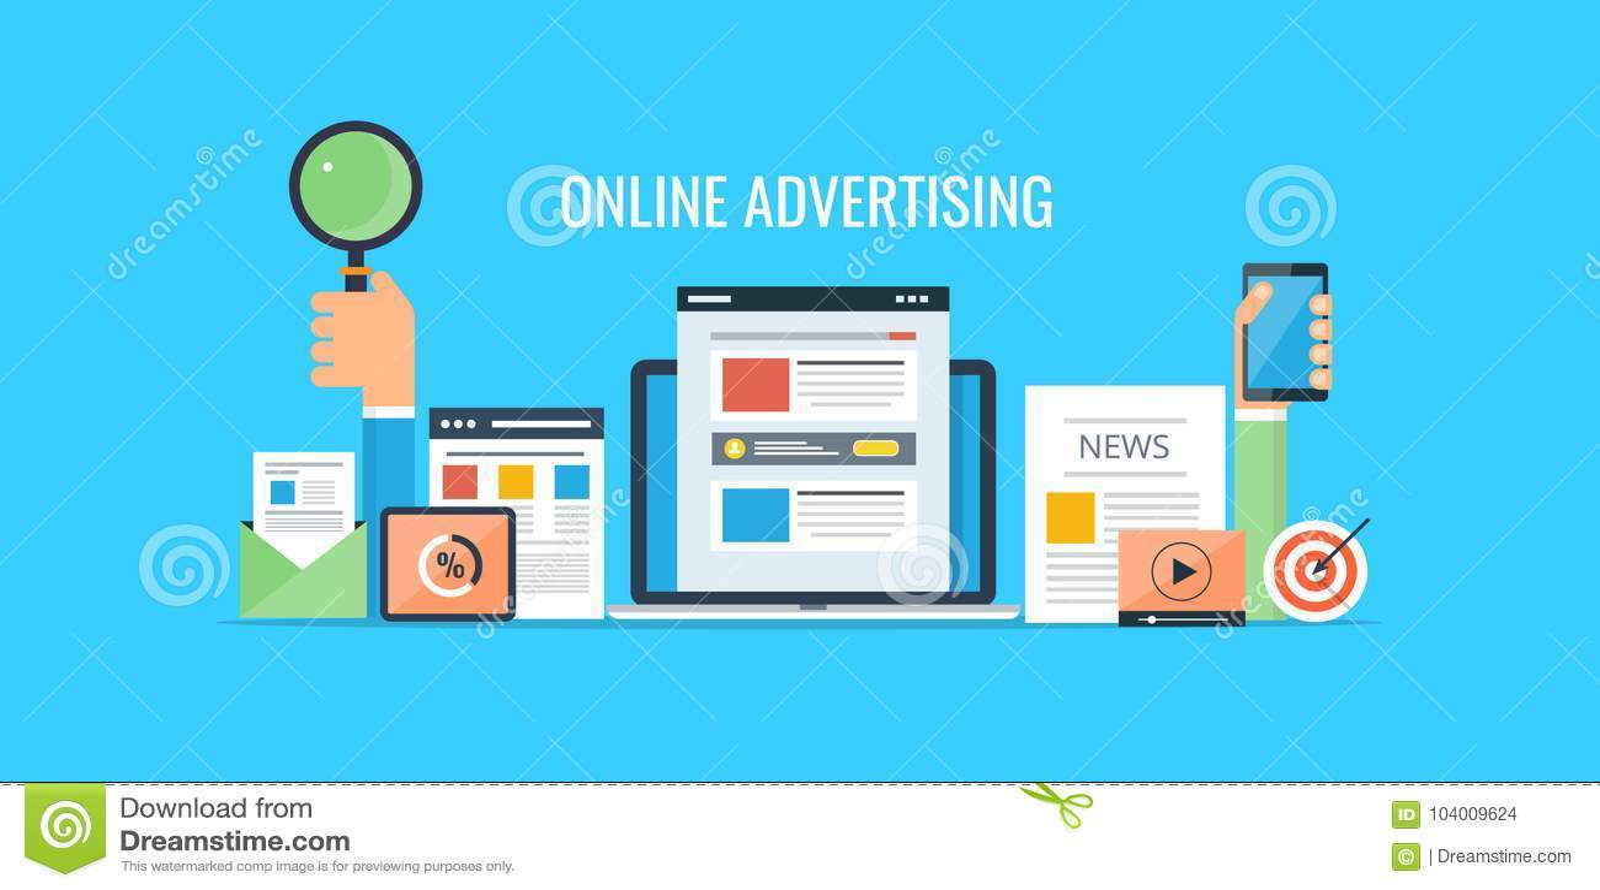 Advertising online - website marketing - commercial selling. Flat design advertising banner.